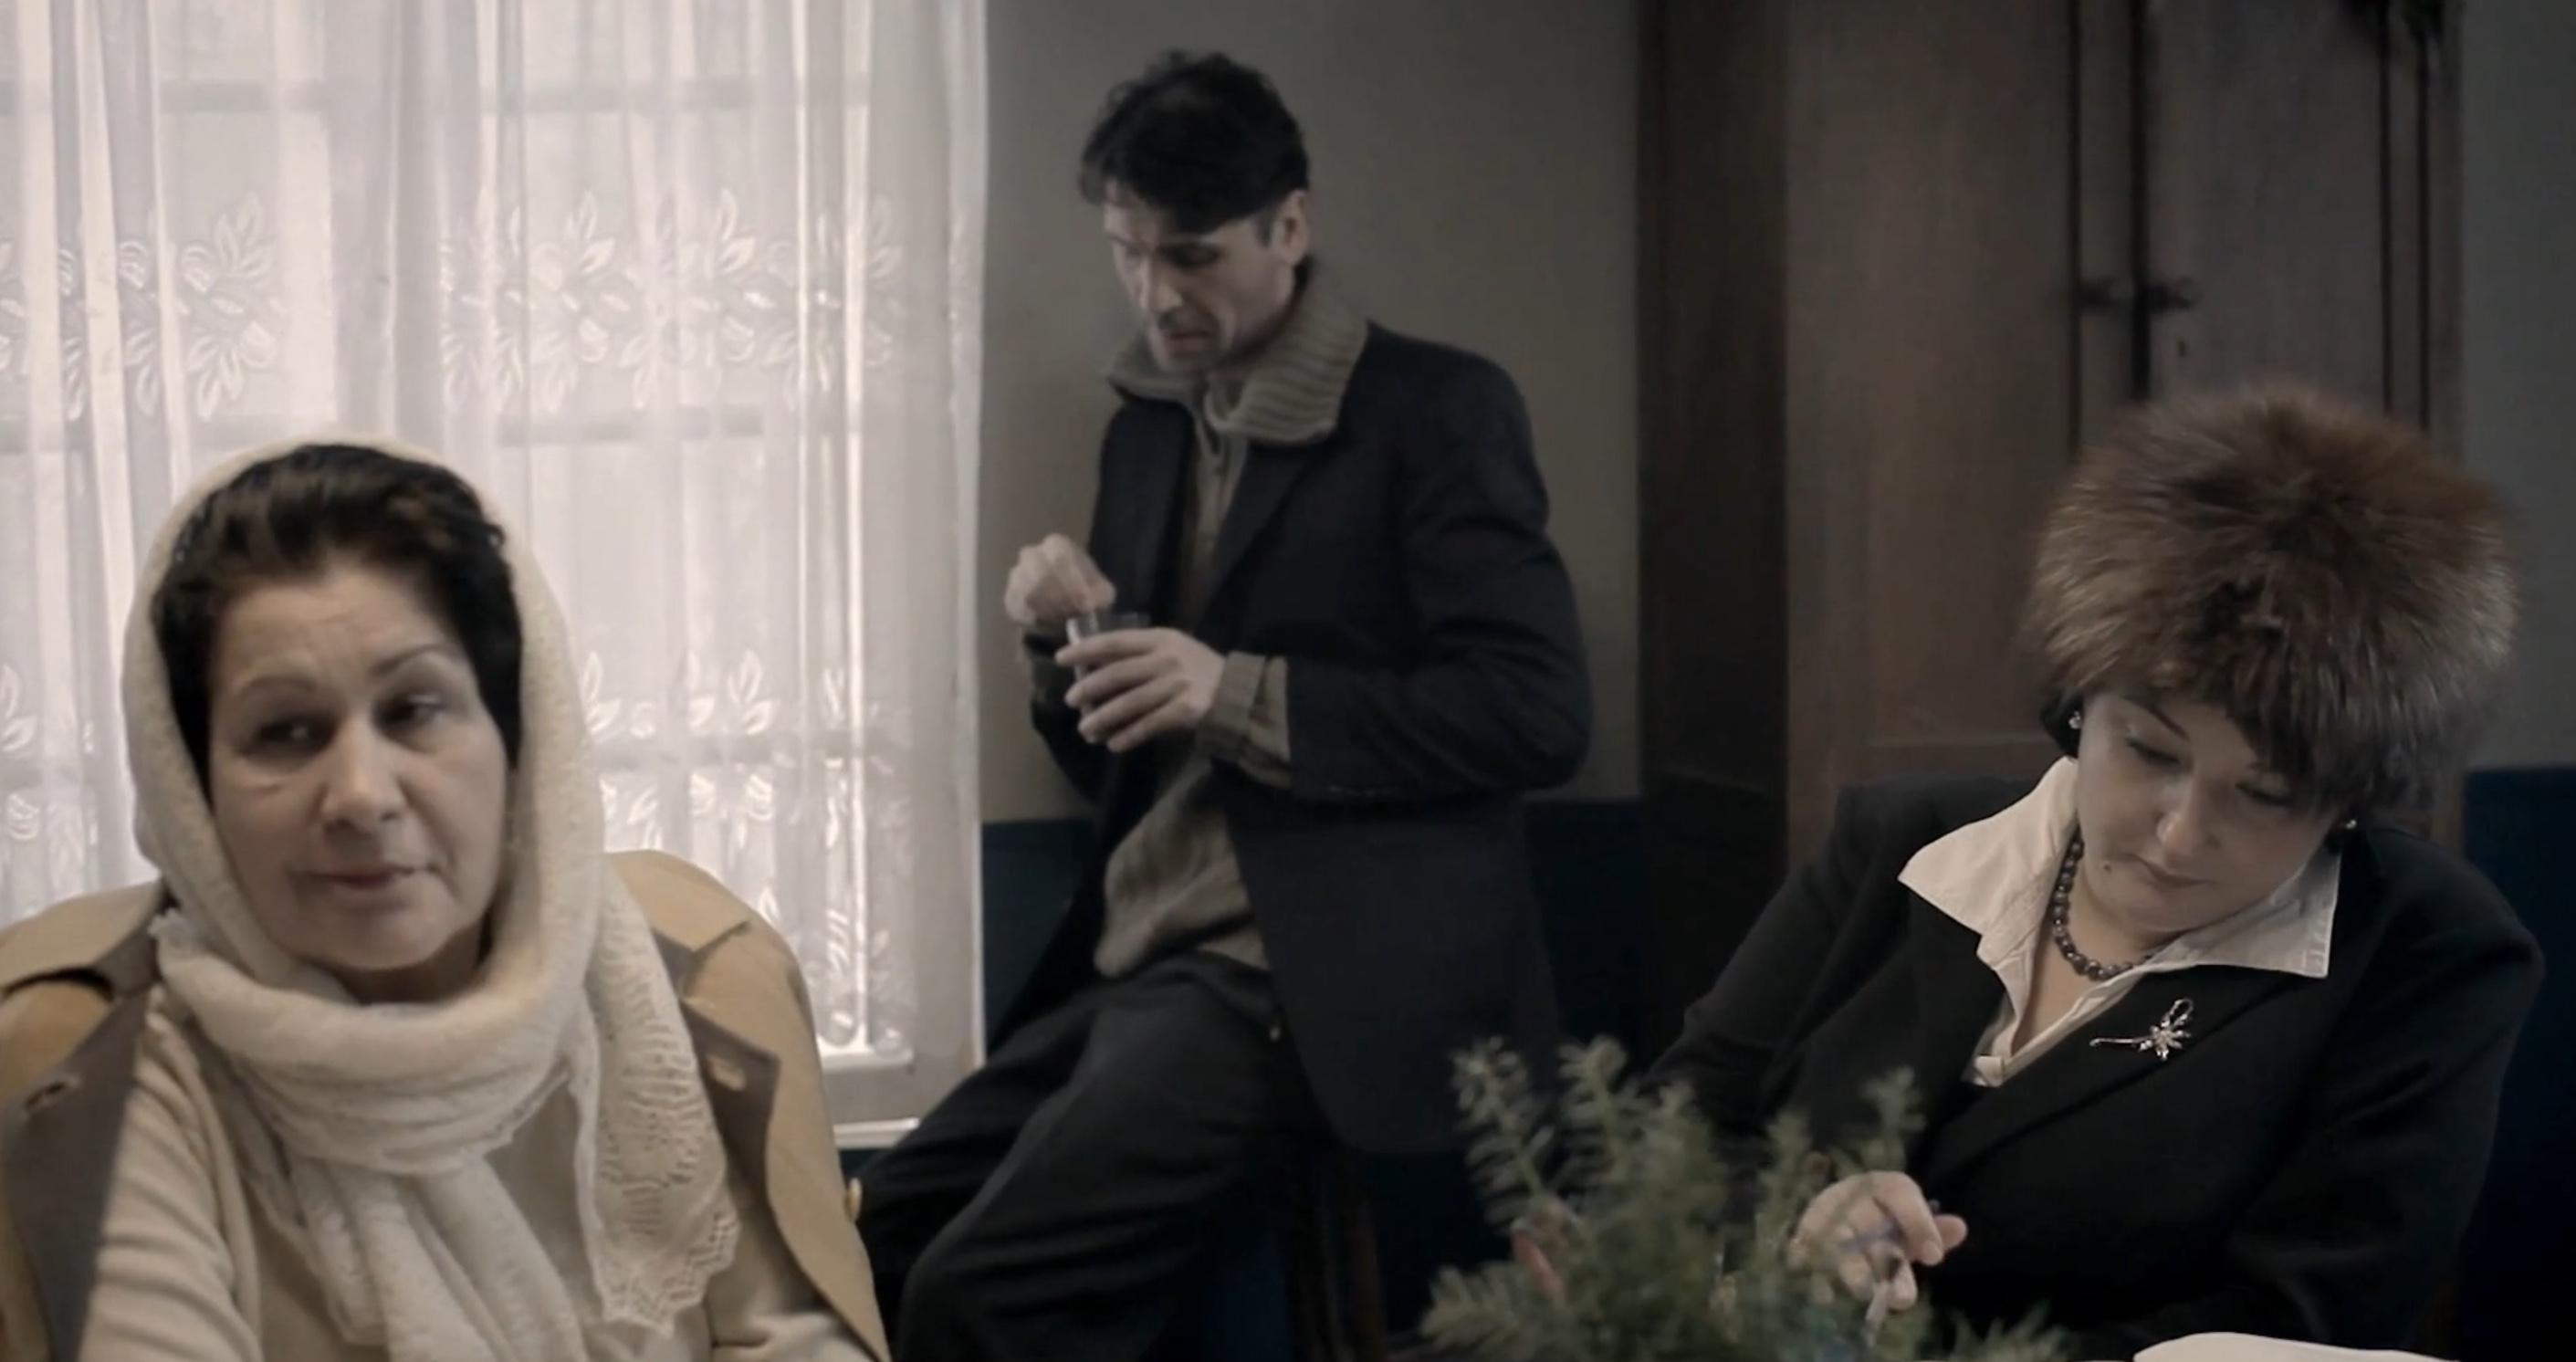 Court métrage Chers amis de Valeriu Andriuta (2017)